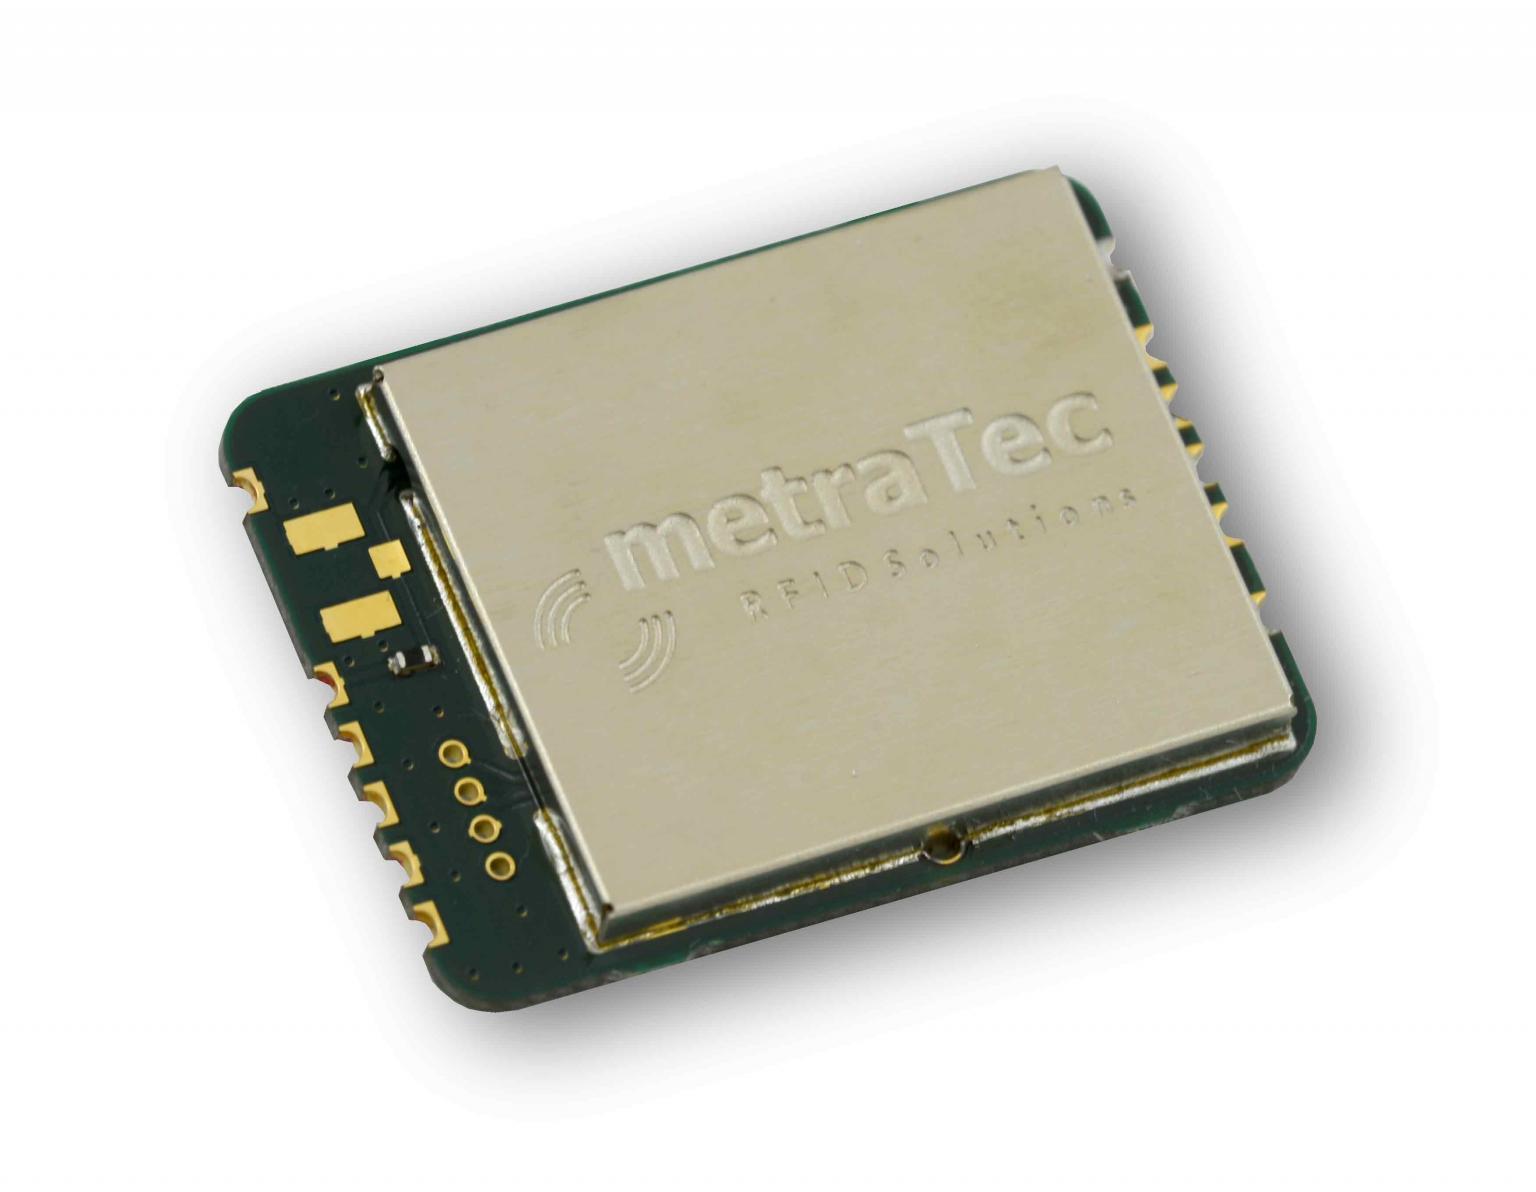 DwarfG2-Mini UHF RFID module